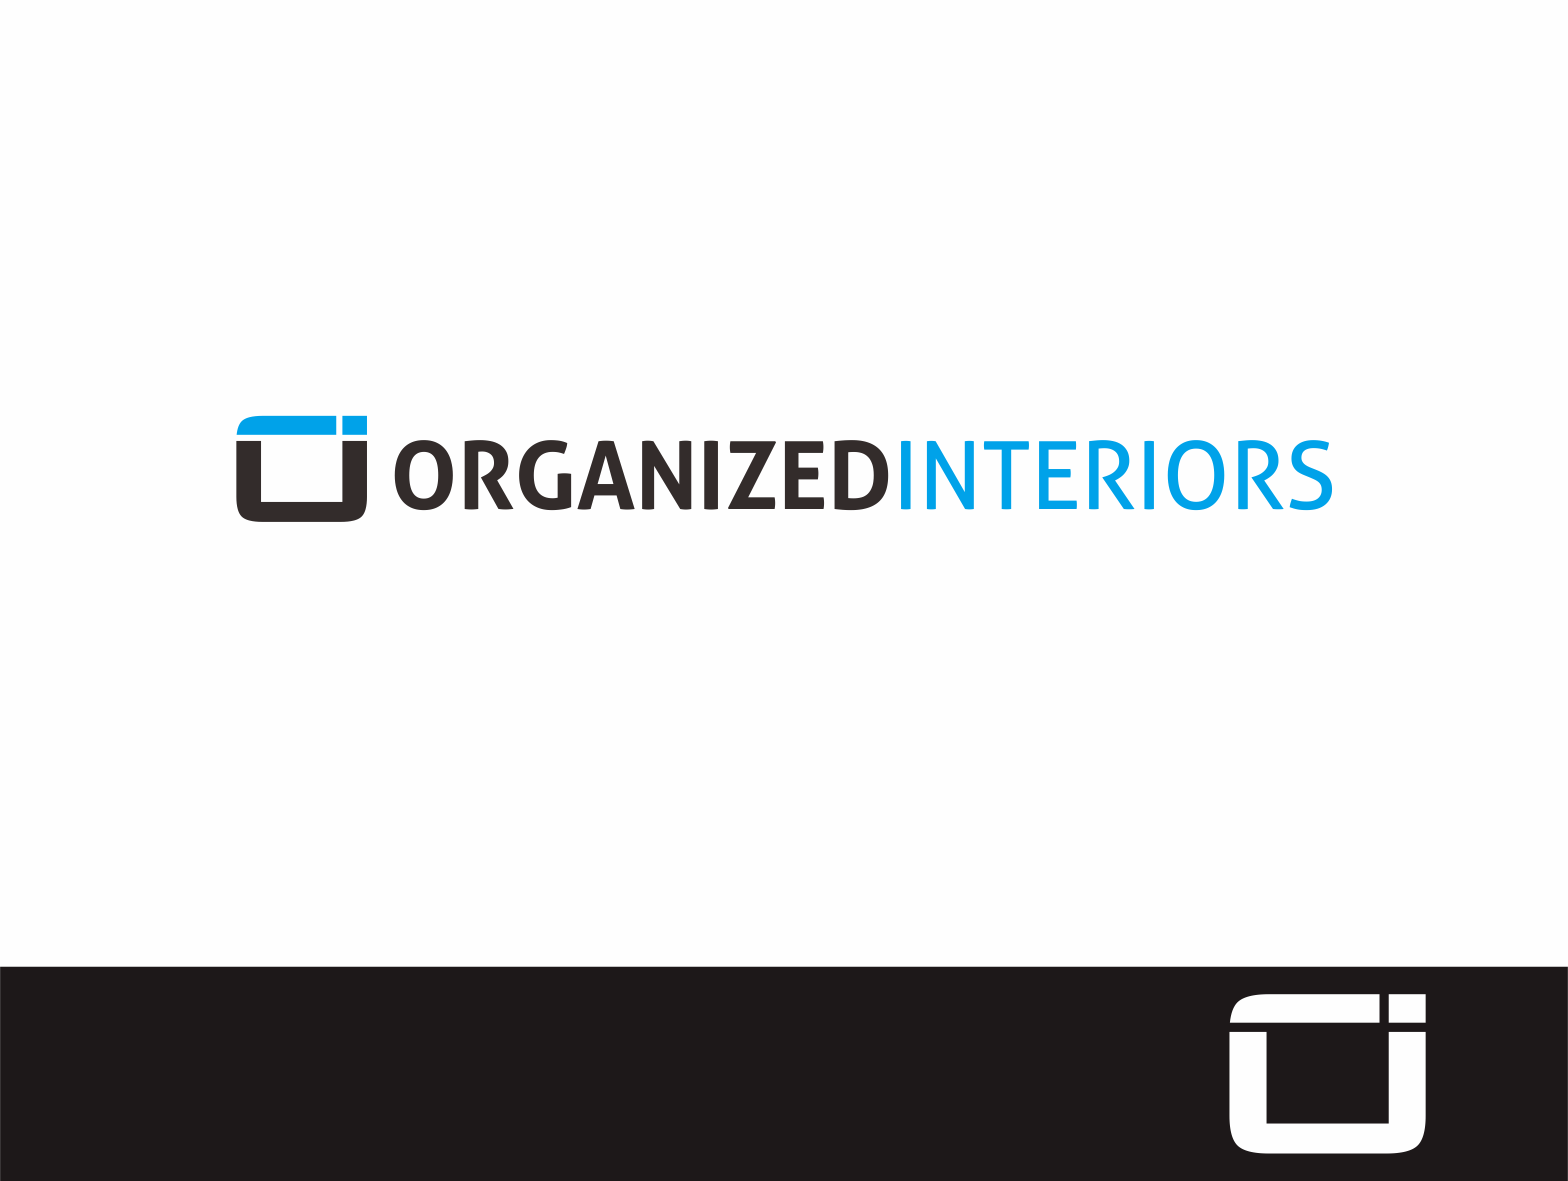 Logo Design by Armada Jamaluddin - Entry No. 54 in the Logo Design Contest Imaginative Logo Design for Organized Interiors.